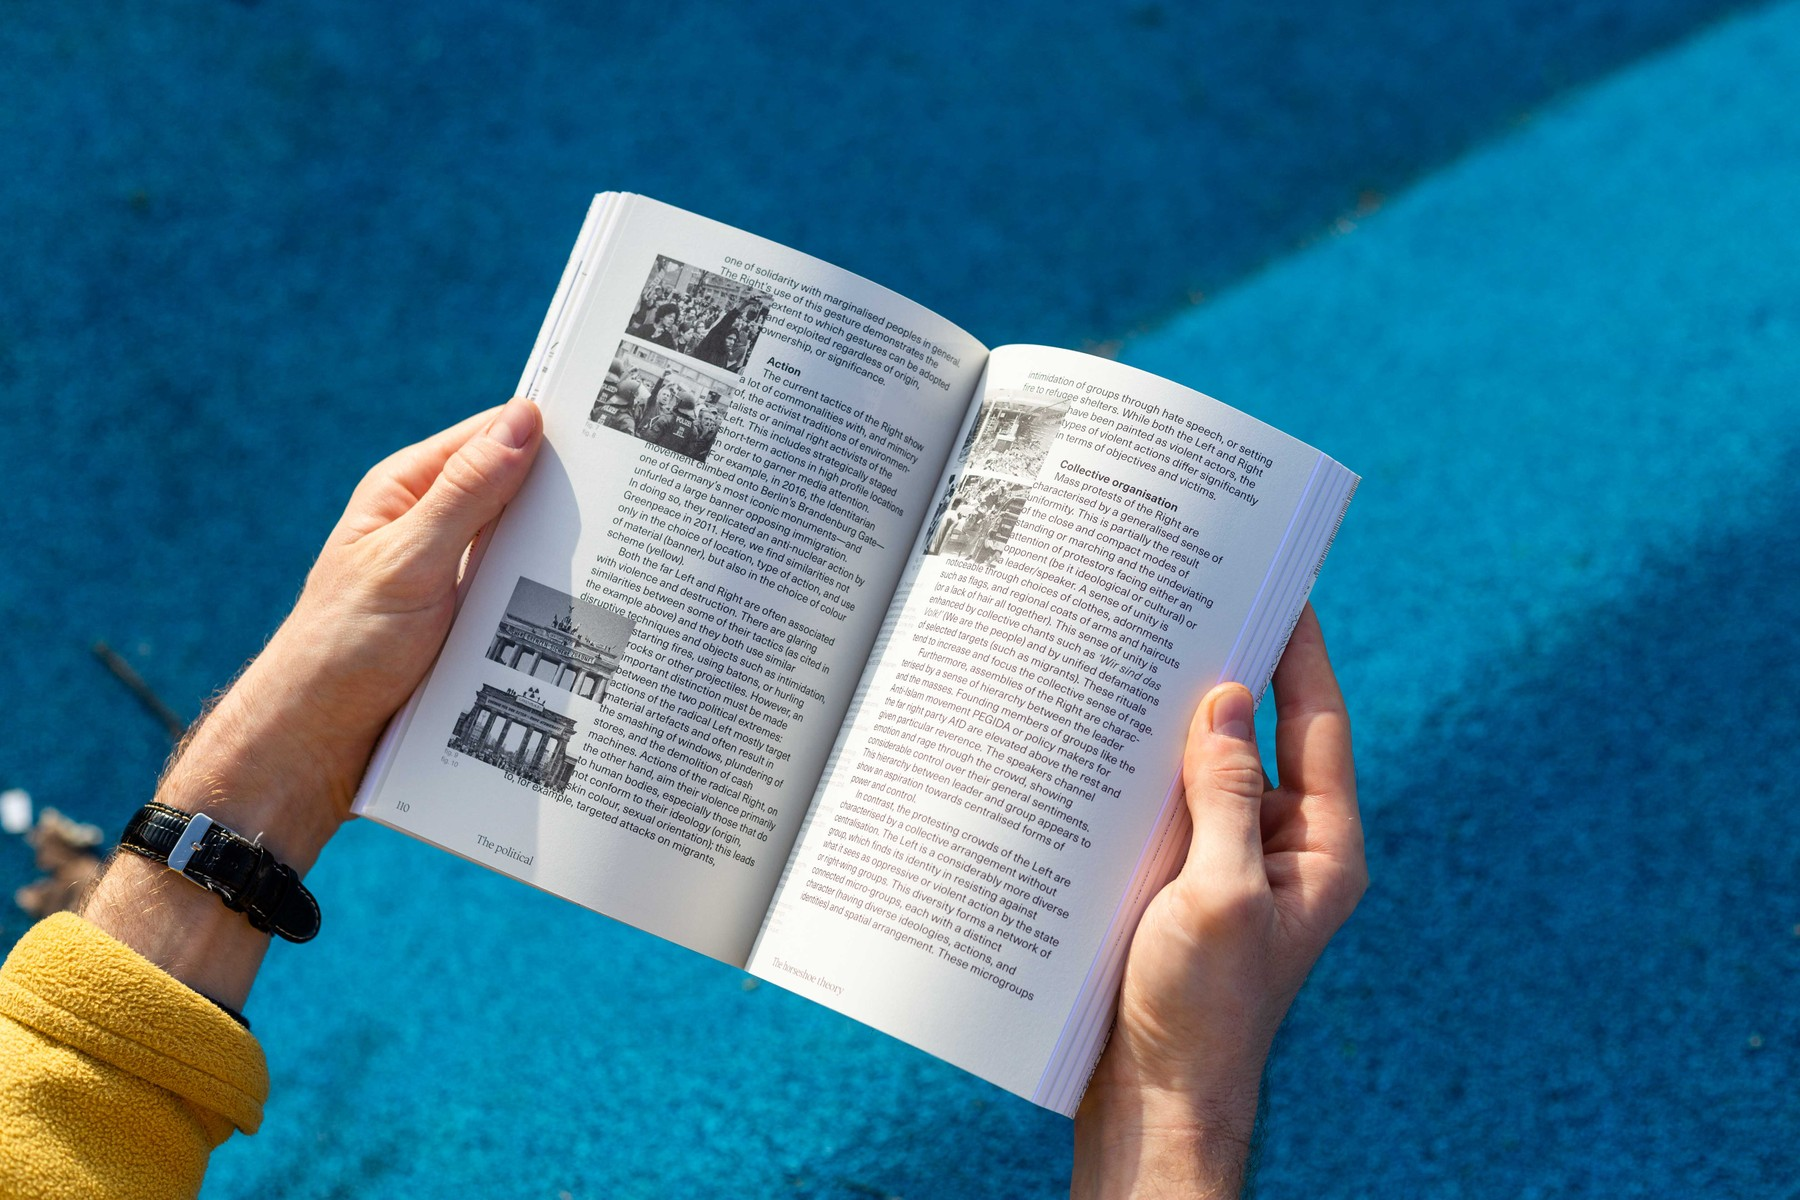 valiz_social_matter_book_inside_2.jpg